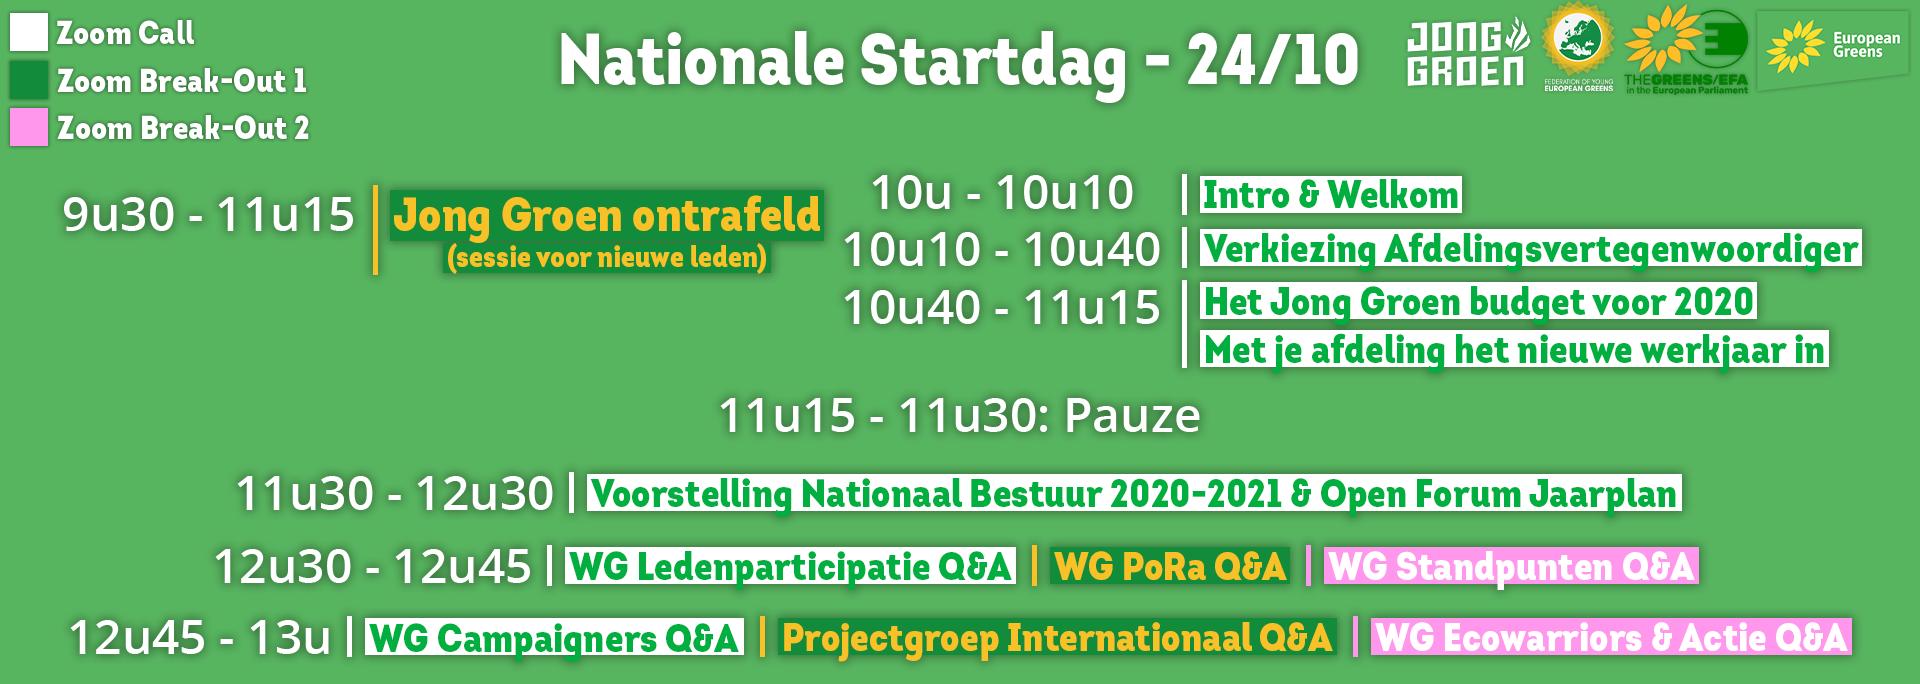 startdag_agenda_vm.png